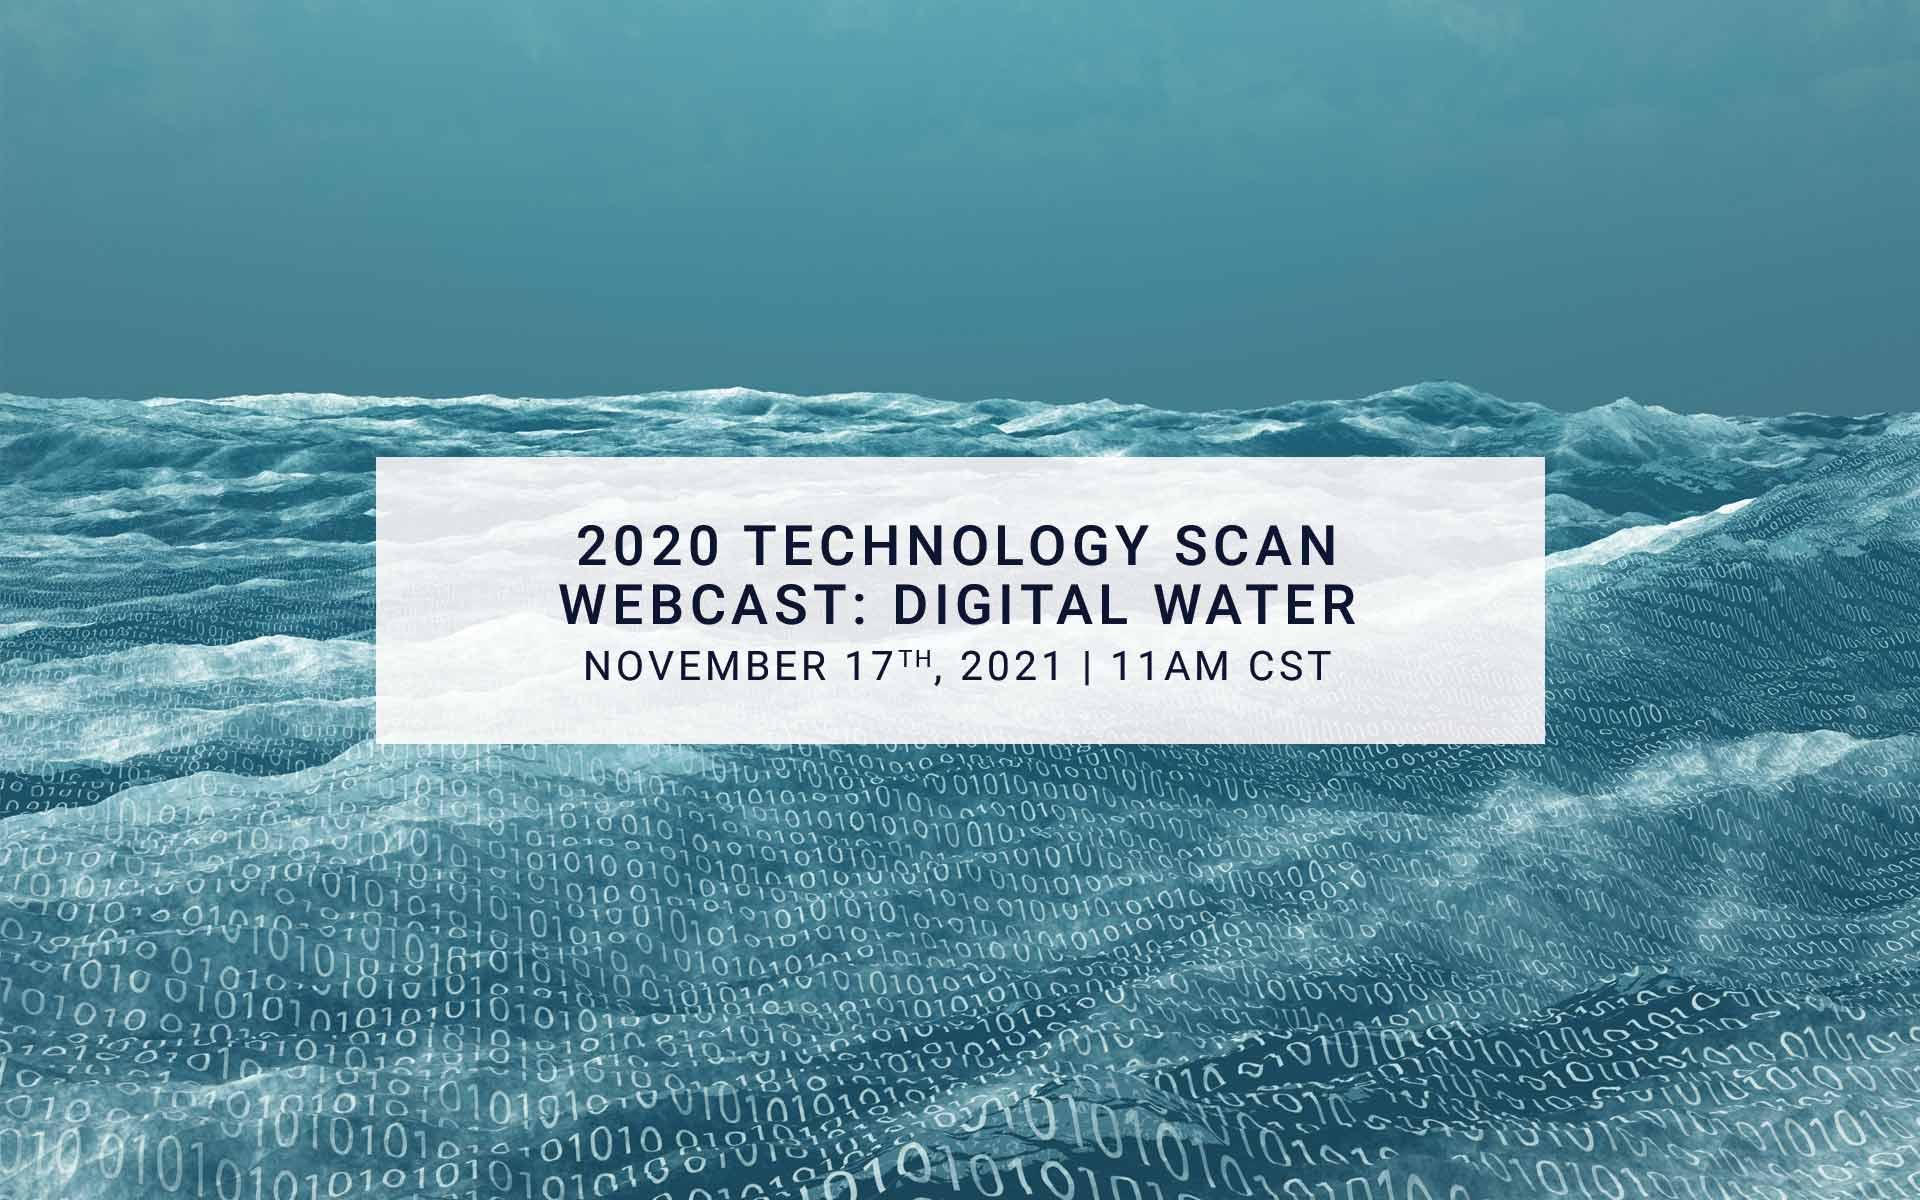 2020 Technology Scan Webcast: Digital Water